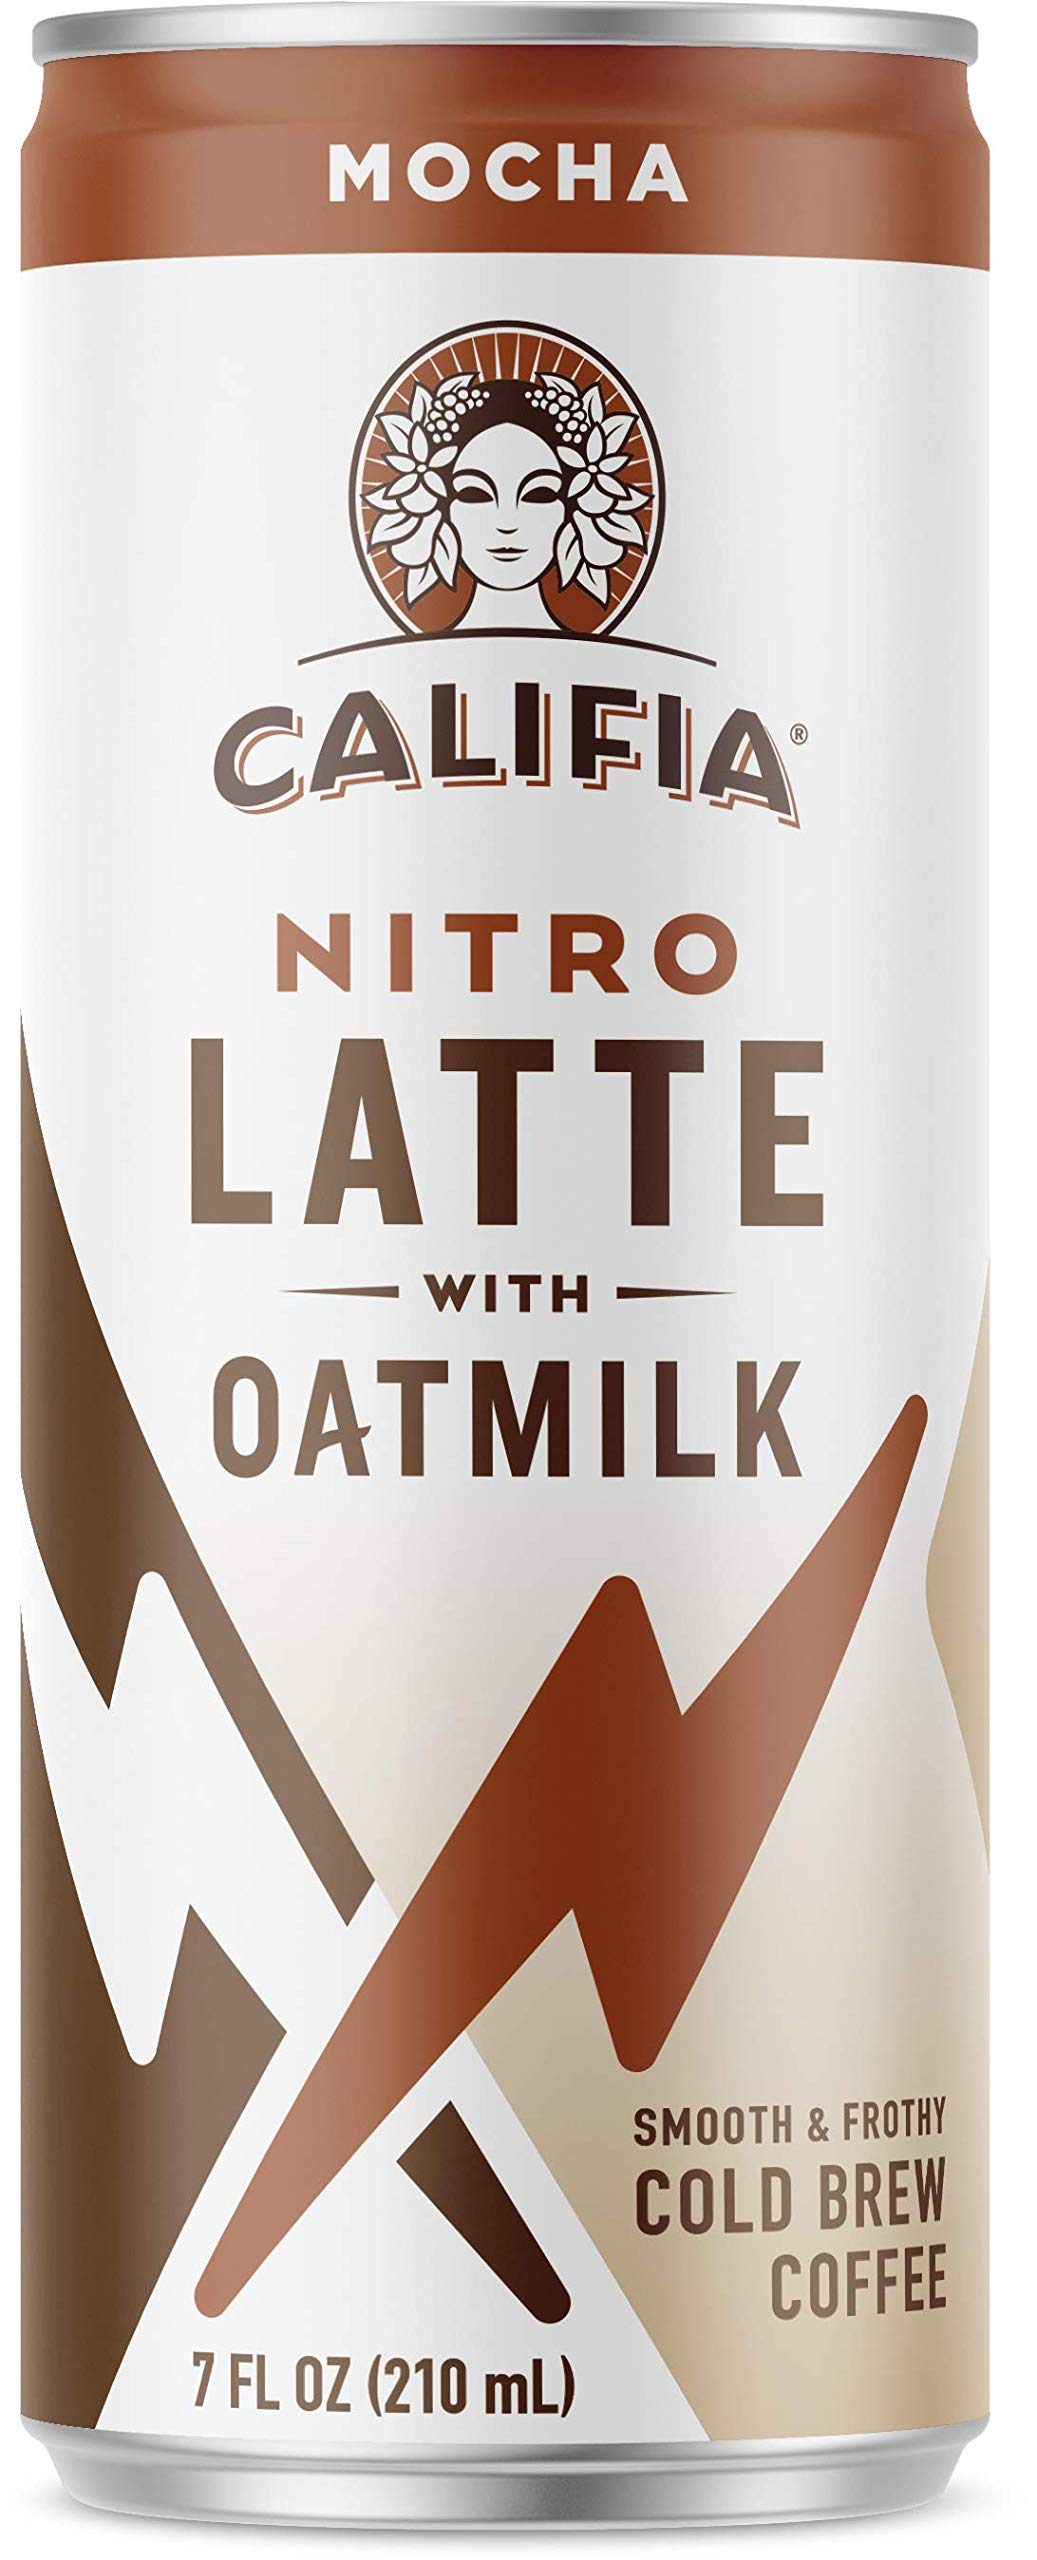 Califia Farms Mocha Oatmilk Nitro Draft Latte Cold Brew Coffee, 7 Oz (12 Cans) | Dairy Free | Gluten Free | On-the-Go | Clean Energy | Plant Based | Non-GMO by Califia Farms